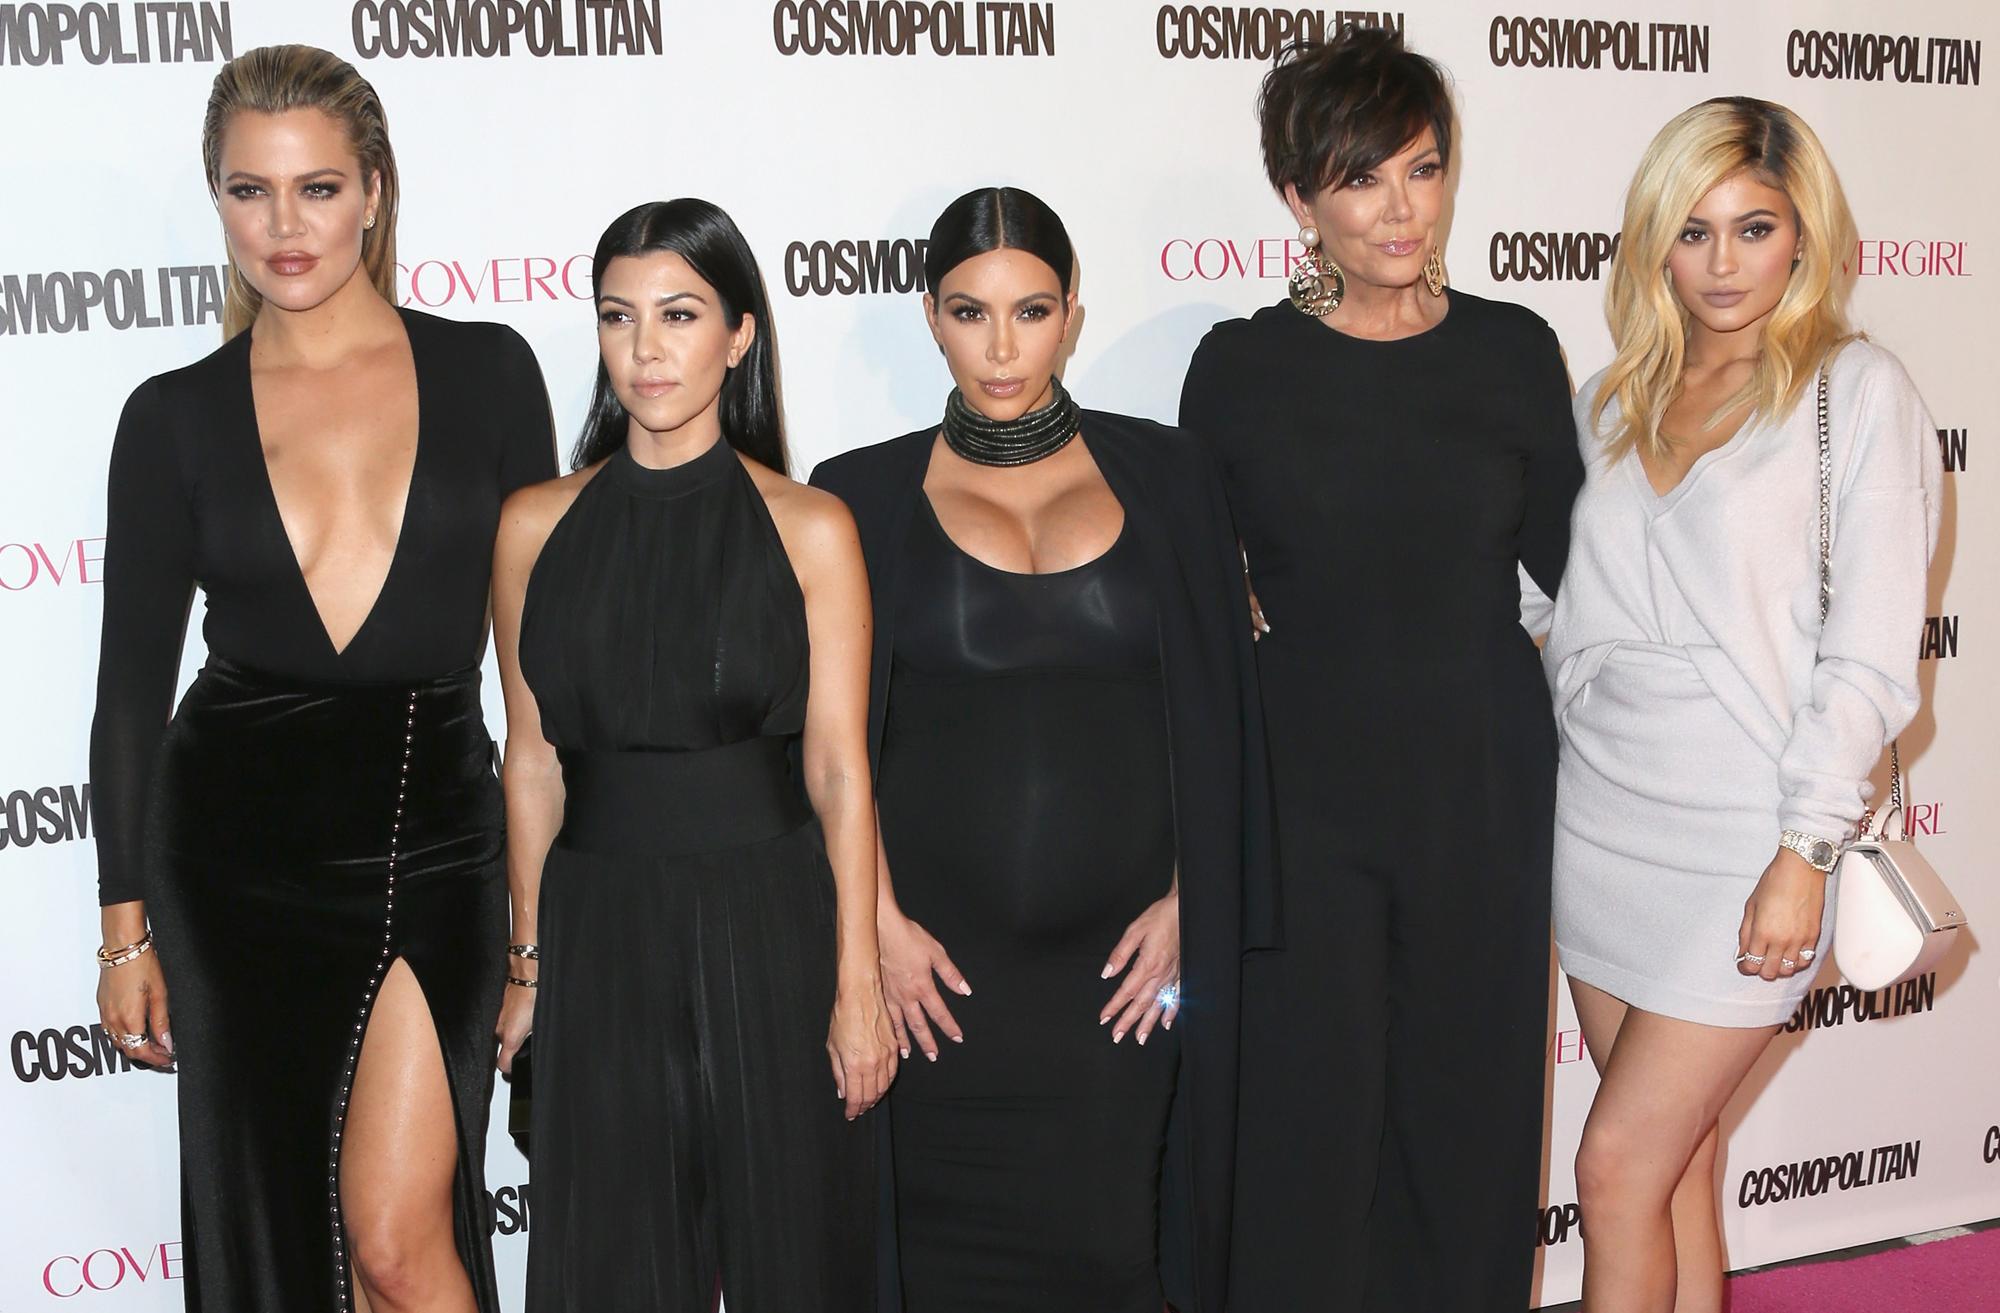 Tarjeta Navide U00f1a De Las Kardashian Causa Pol U00e9mica Por